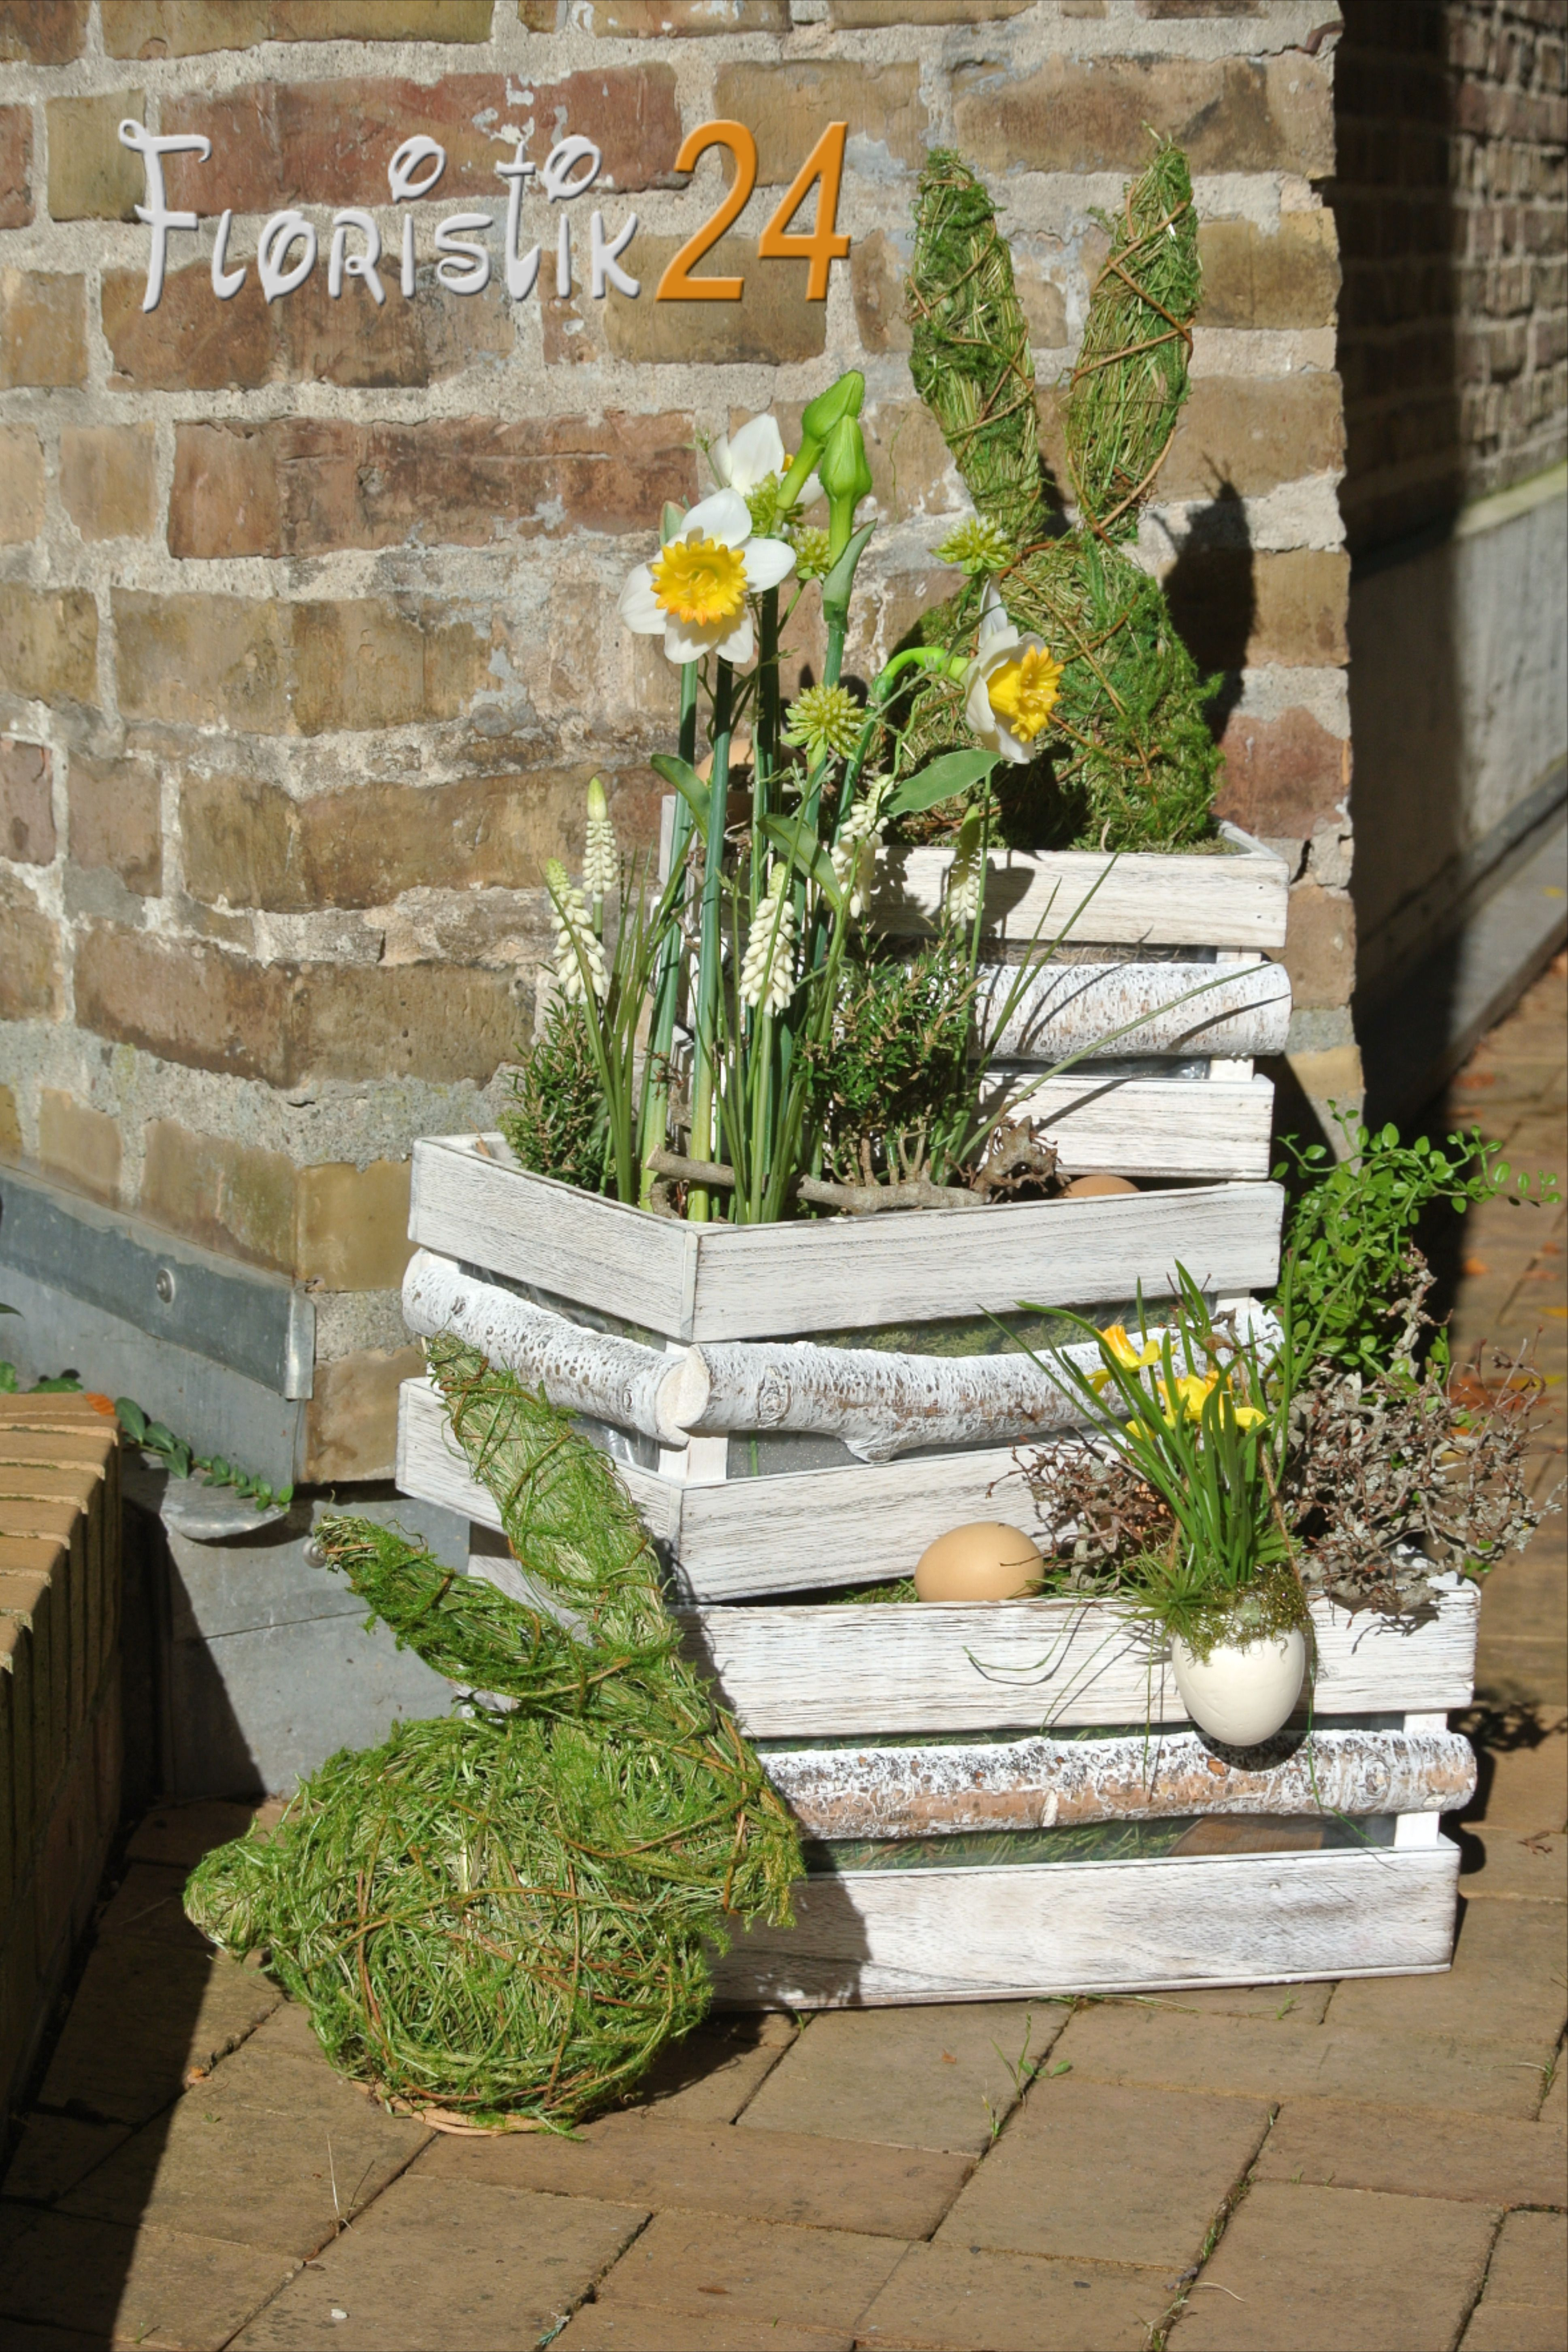 Frühlingsdeko Osterdeko Frühling Ostern Dekoration Gartendeko Holzkiste bepflanzen Frühlingsblumen